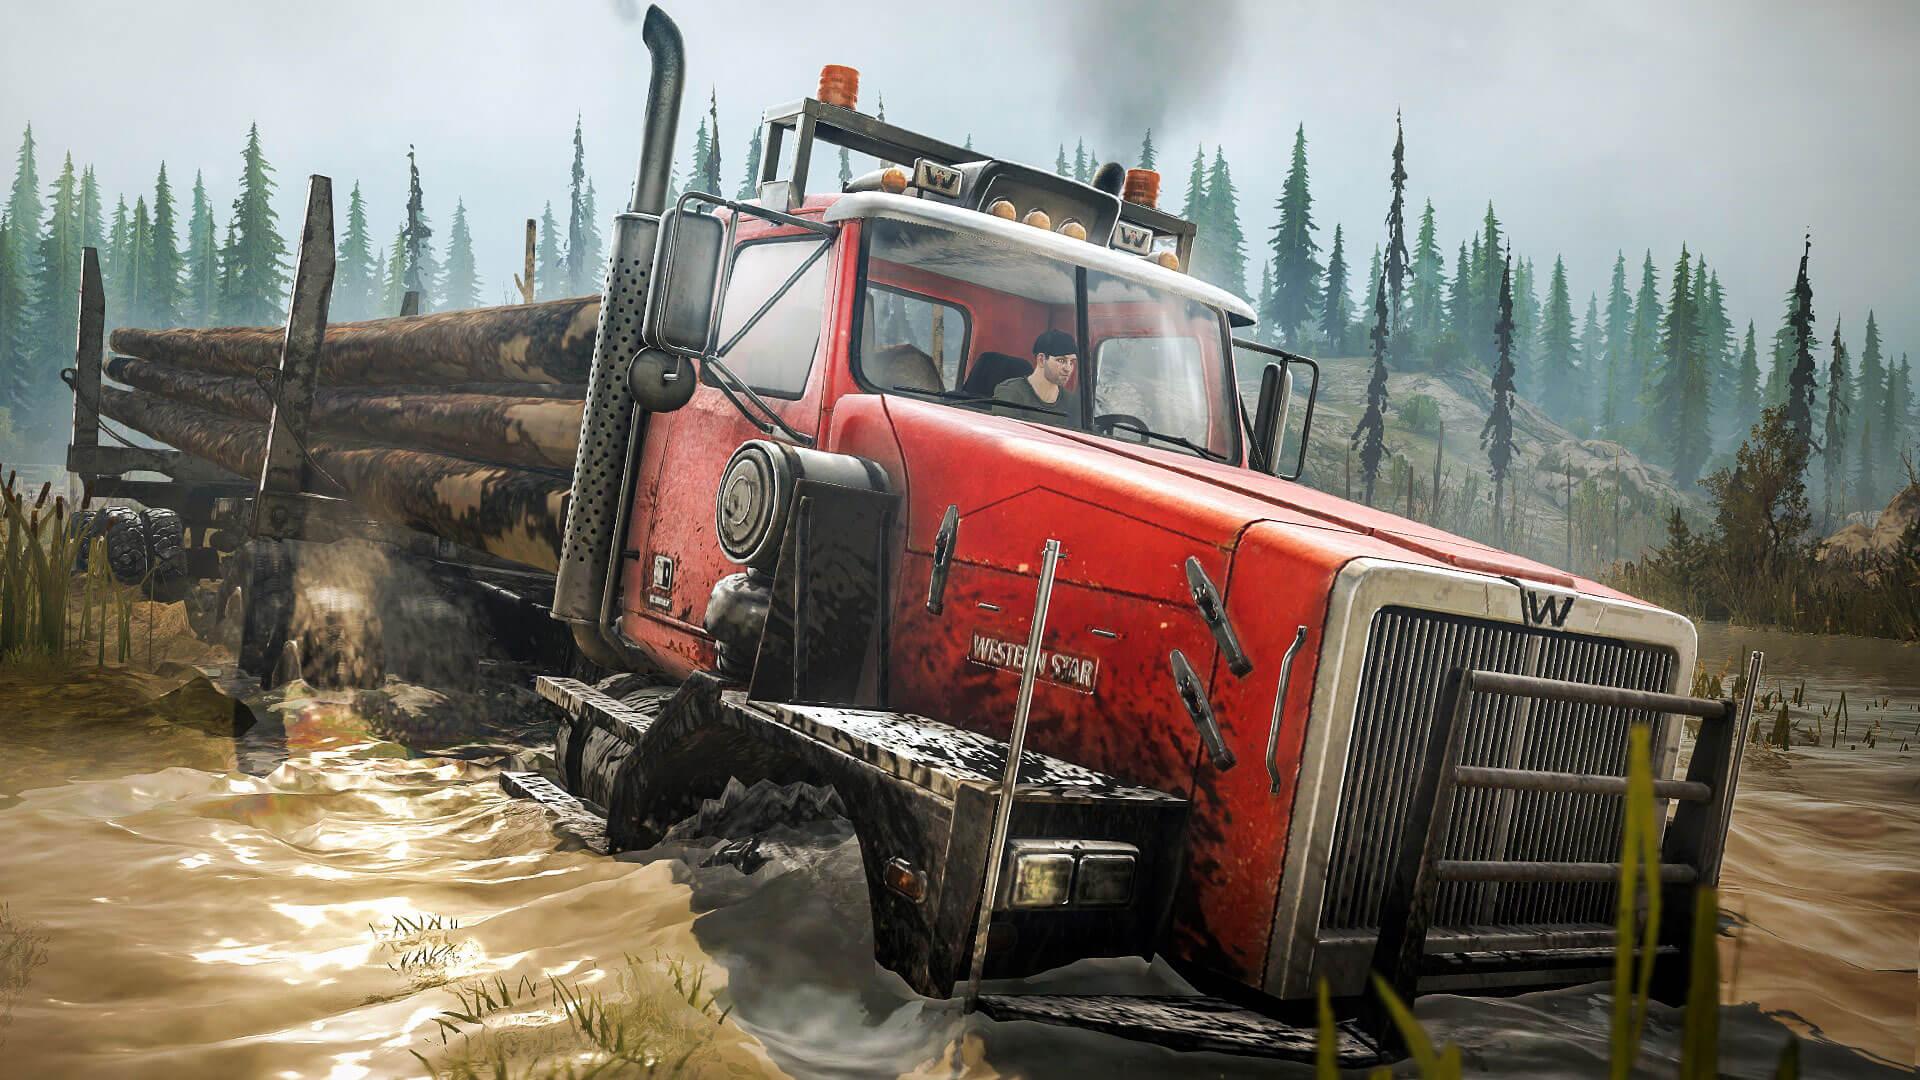 Дата выхода и тизер дополнения Spintires: MudRunner - American Wilds DLC